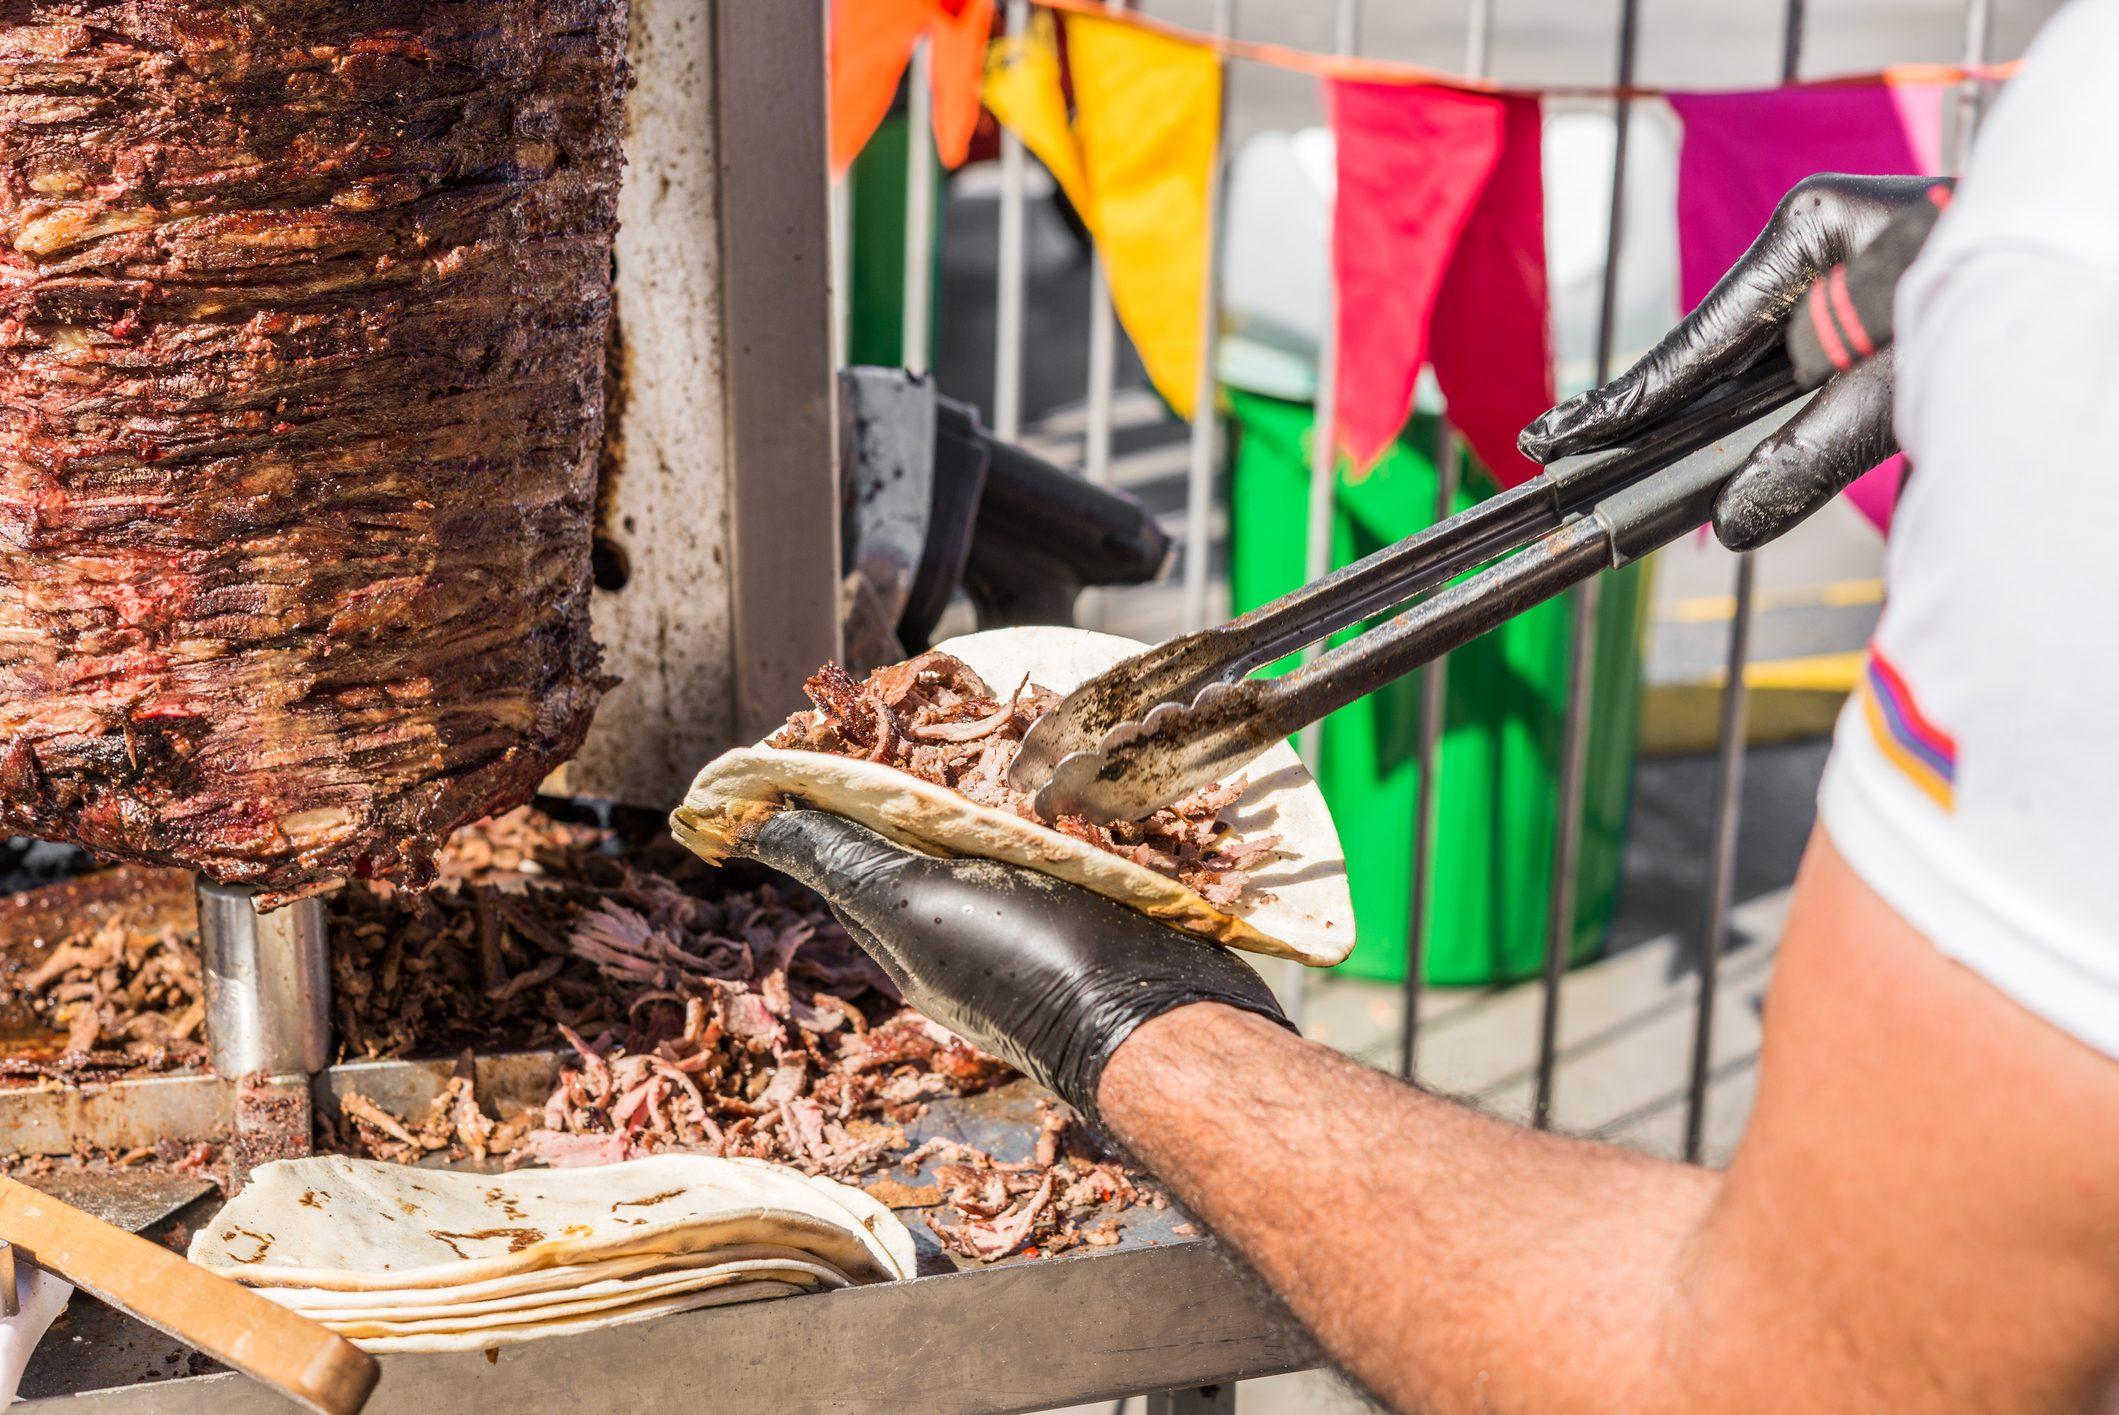 I kebab dal mondo: varianti, caratteristiche e curiosità sui migliori kebab